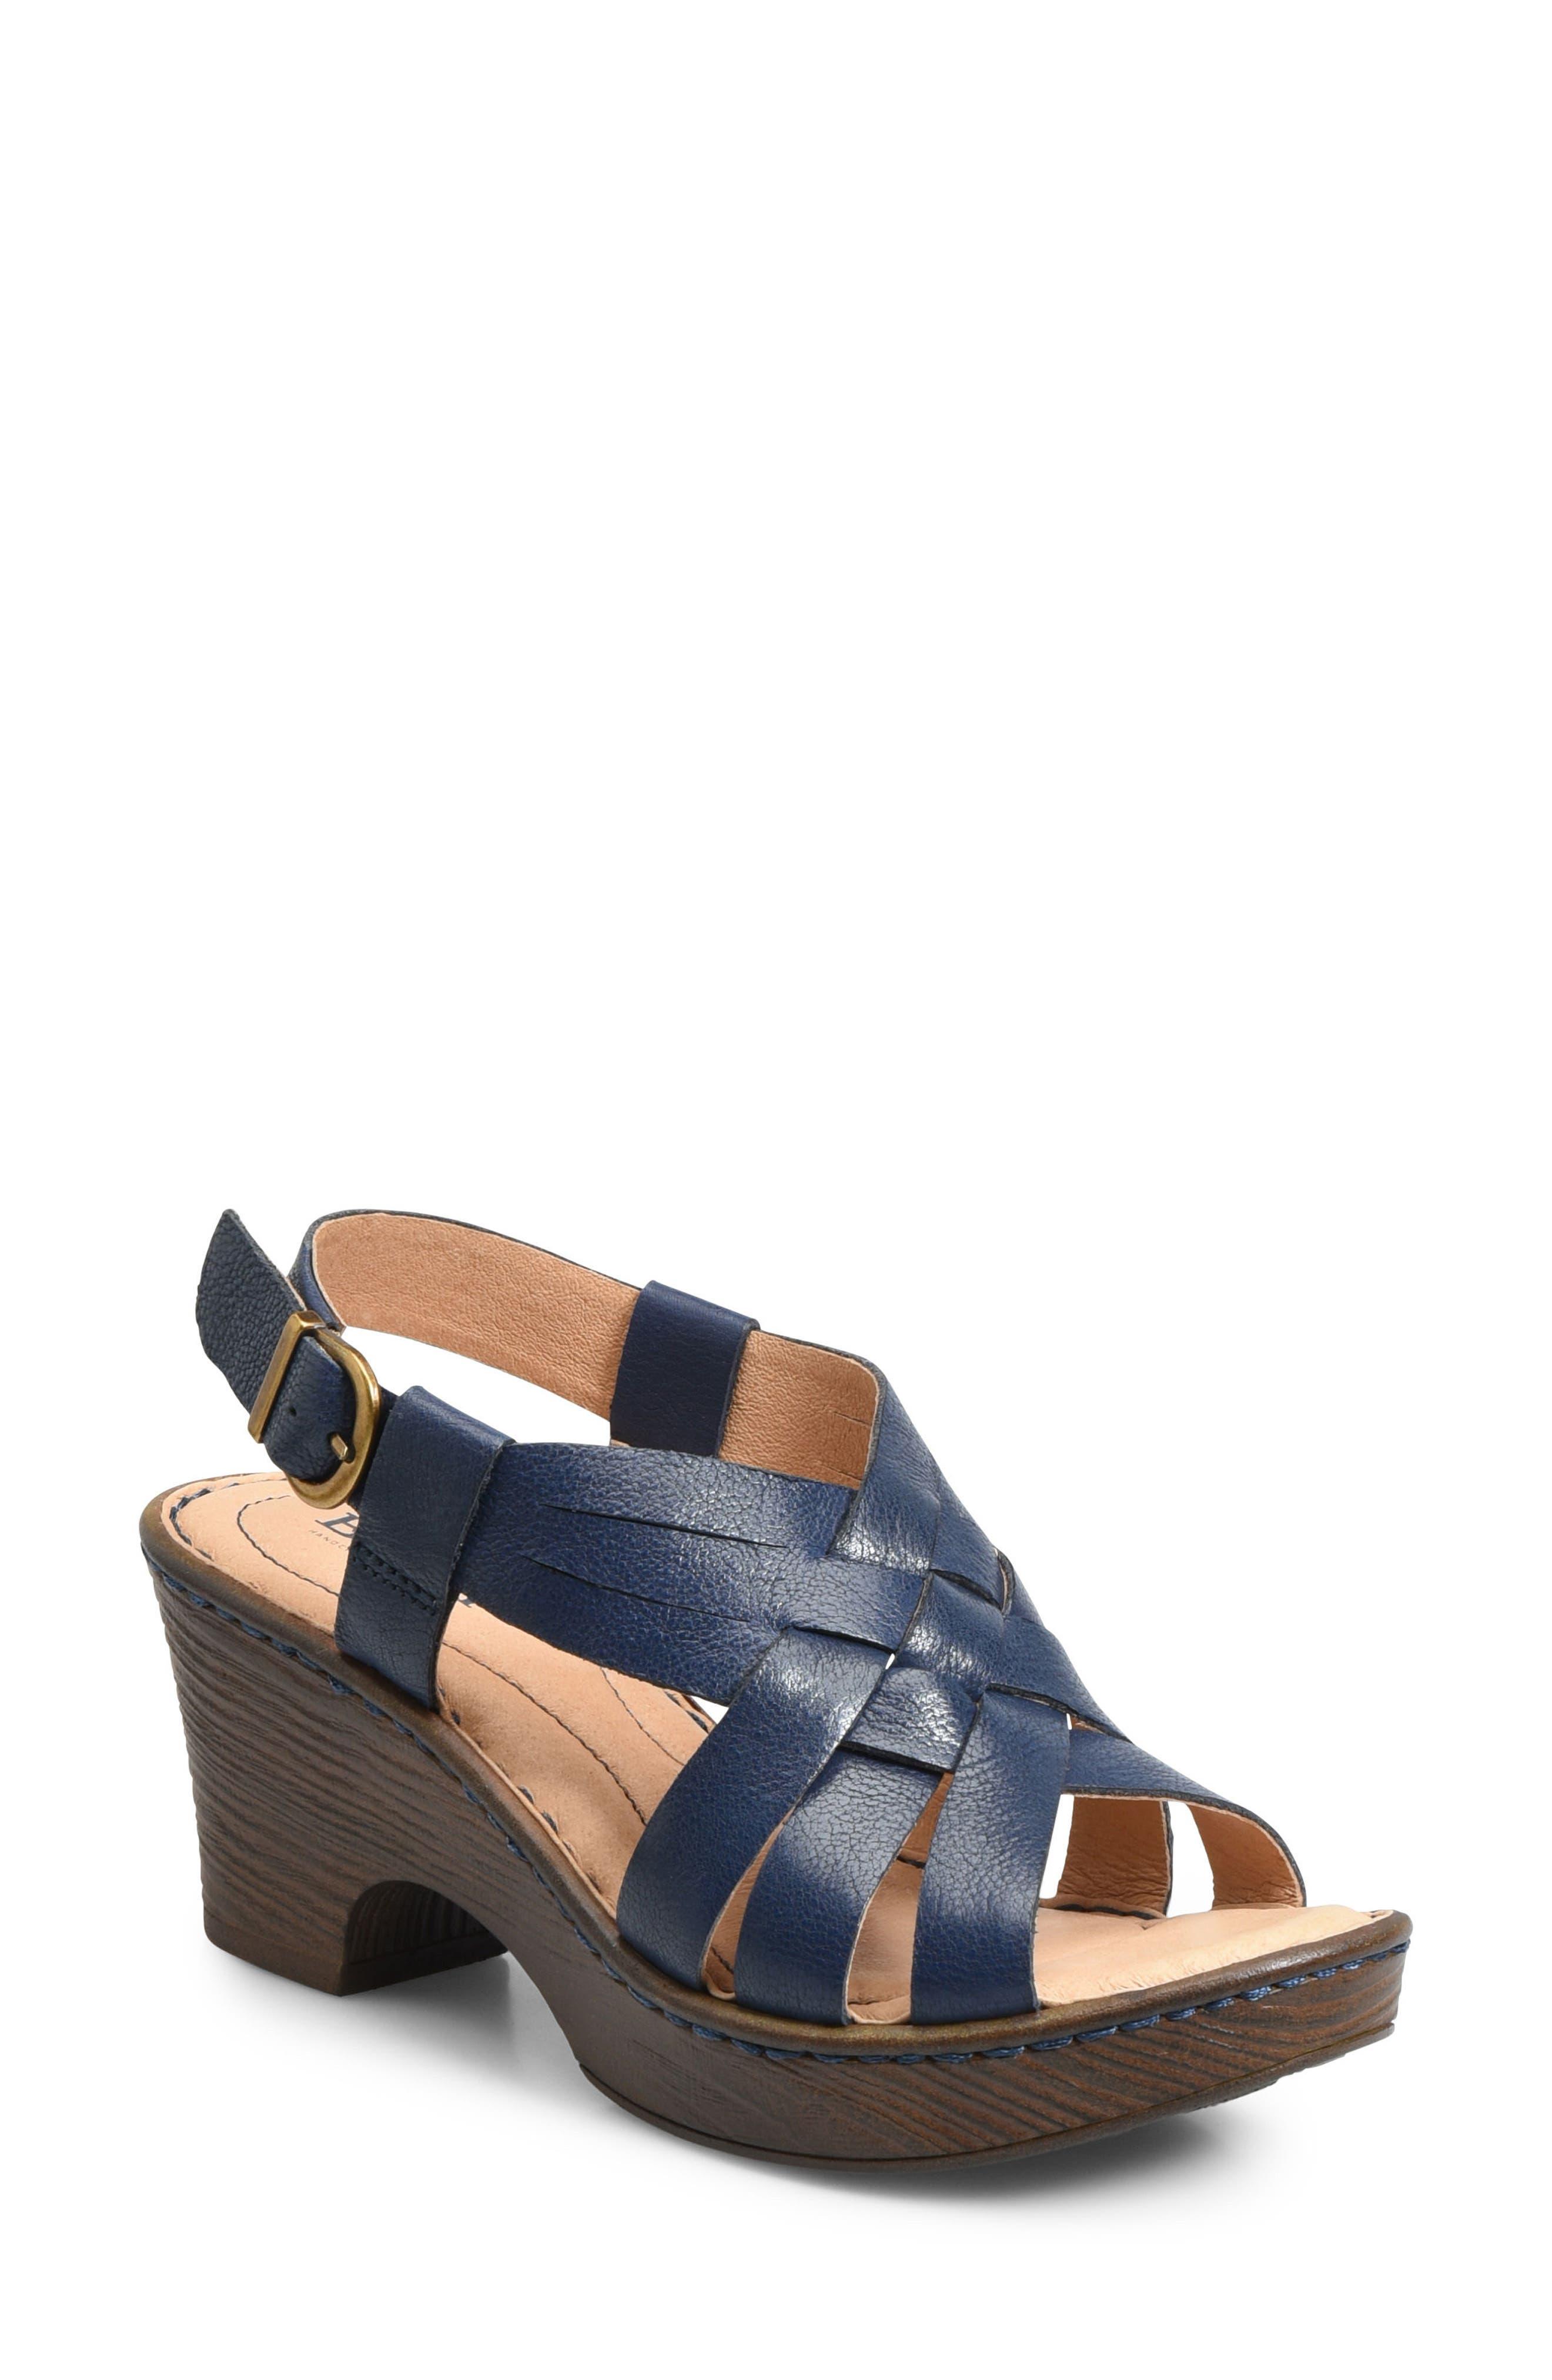 Crevalle Platform Sandal,                         Main,                         color, Navy Leather